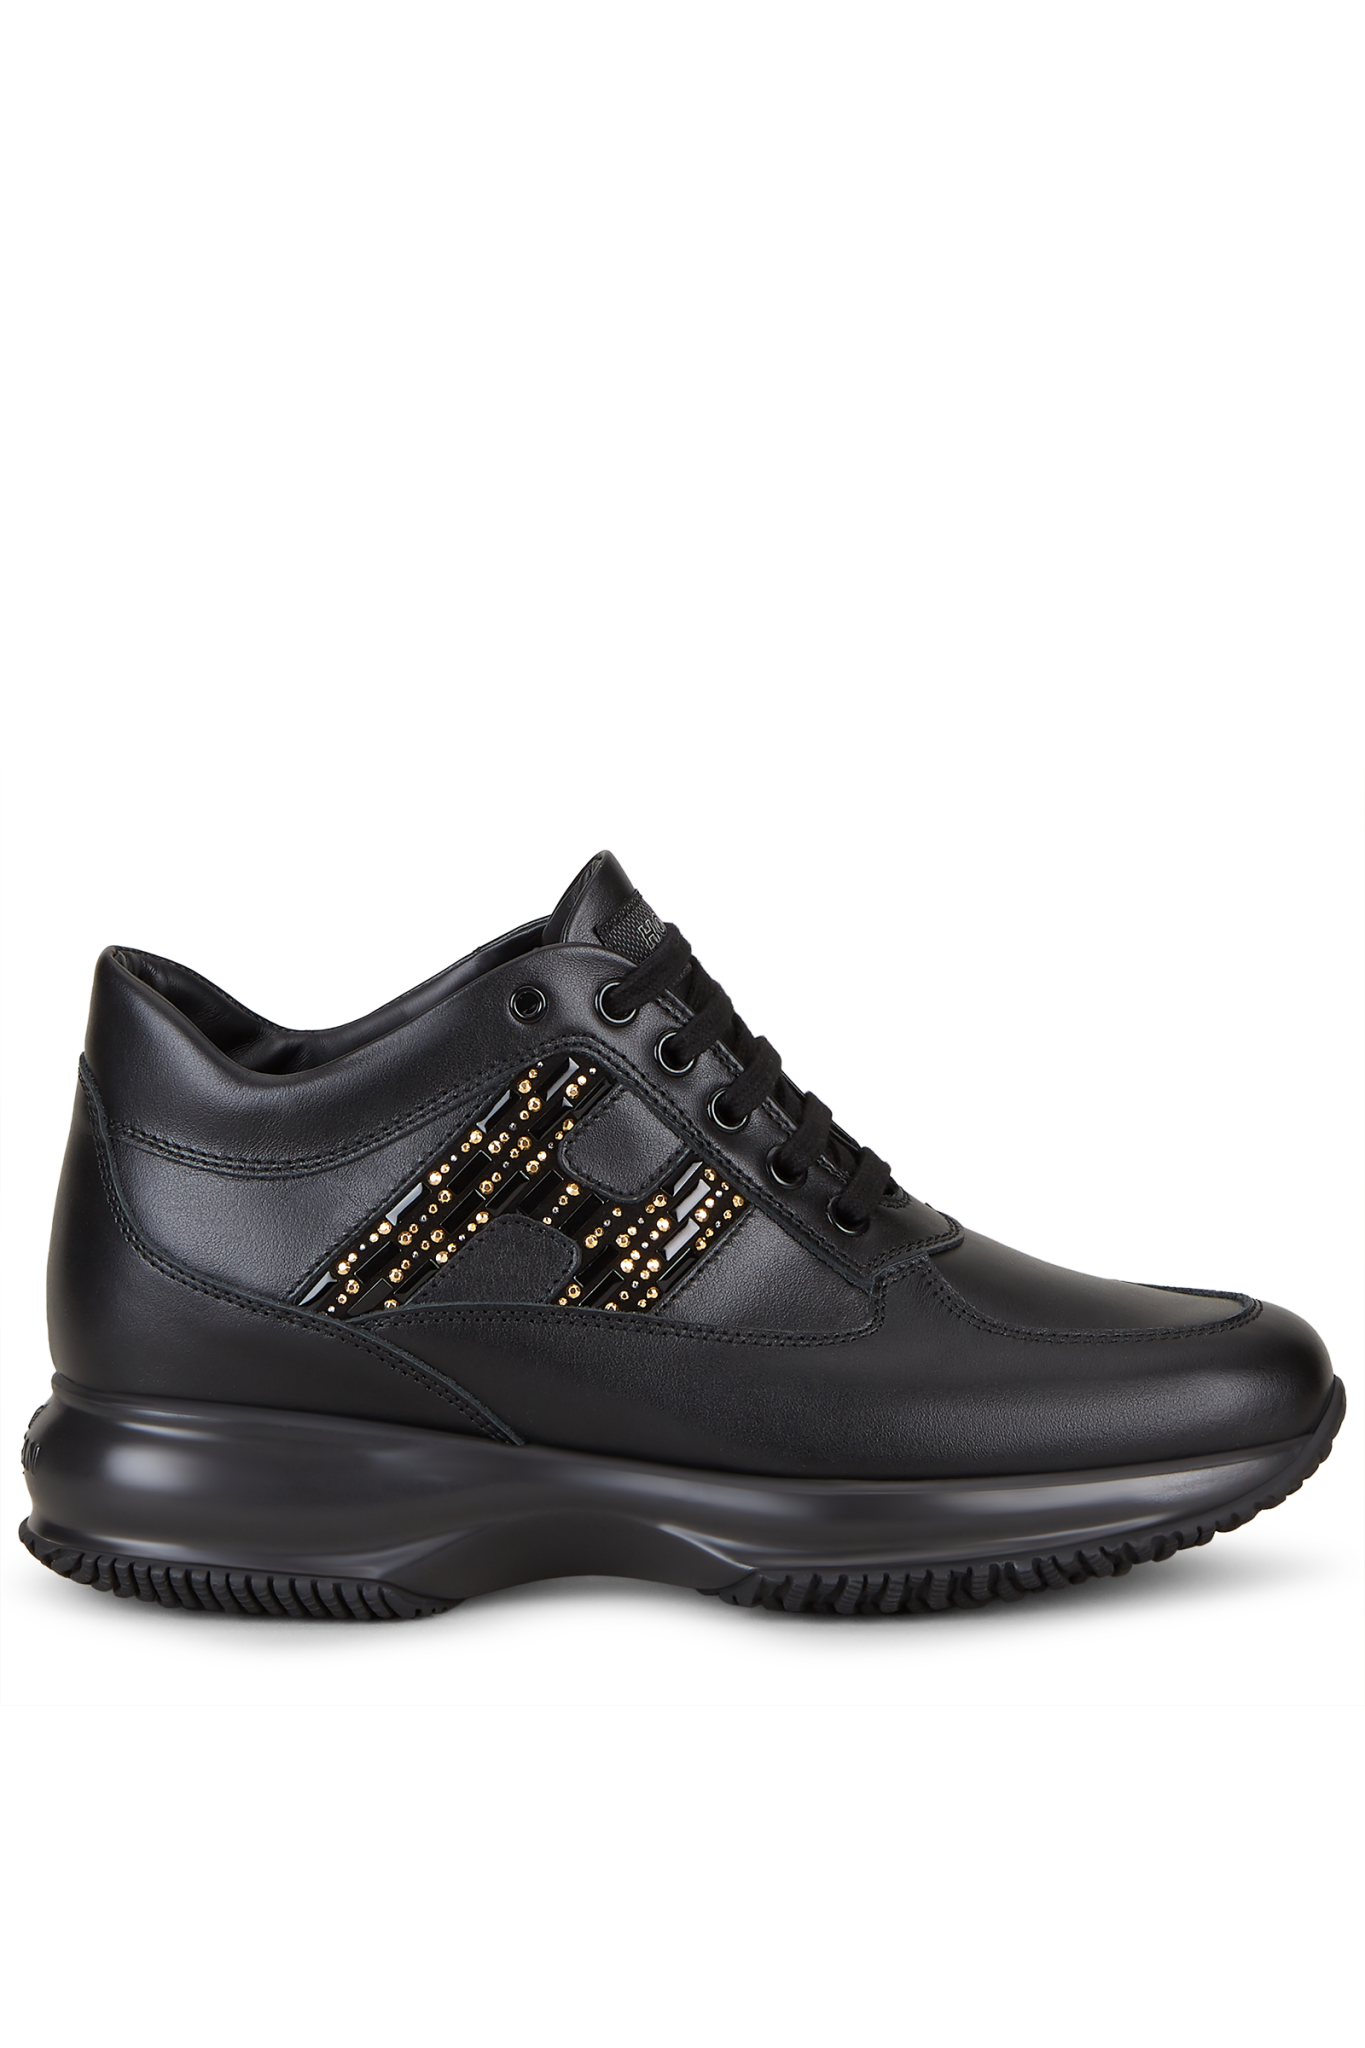 Vendita online scarpe Hogan Interactive in pelle nera da donna.